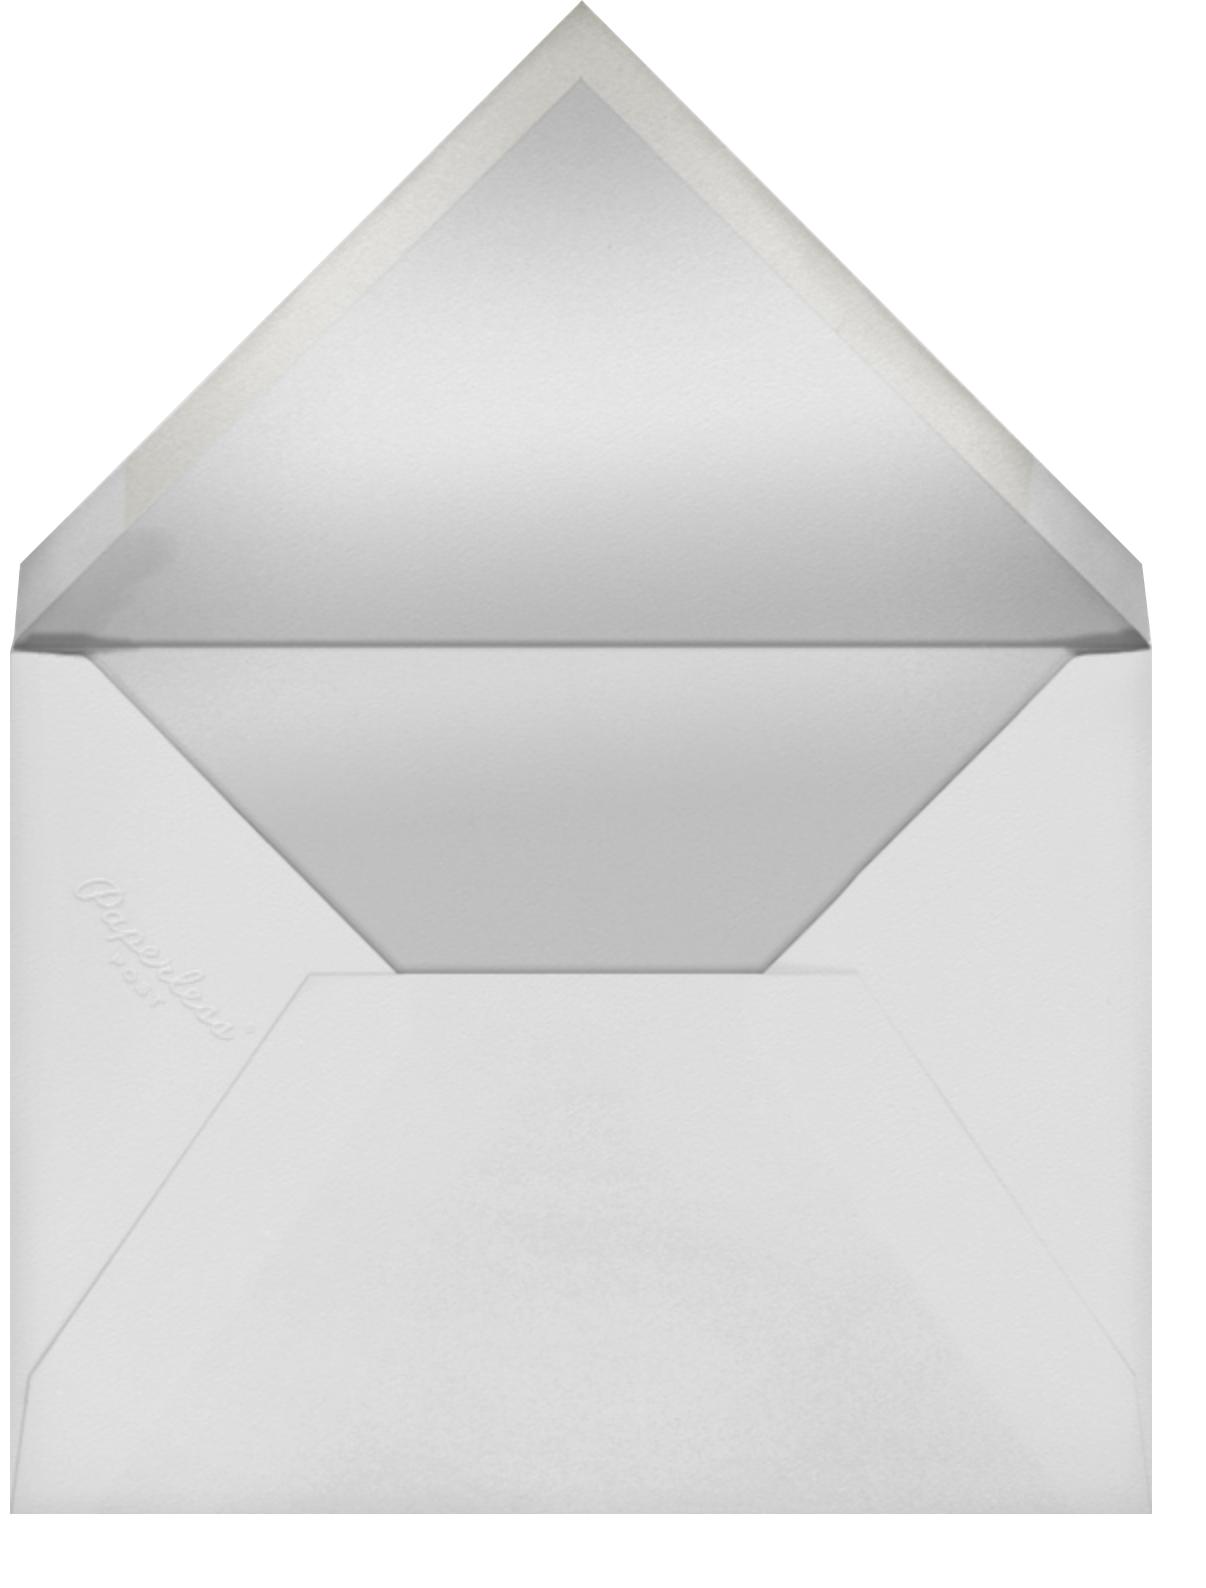 Josephine Baker (Menu) - Black/Silver - Paperless Post - Menus - envelope back